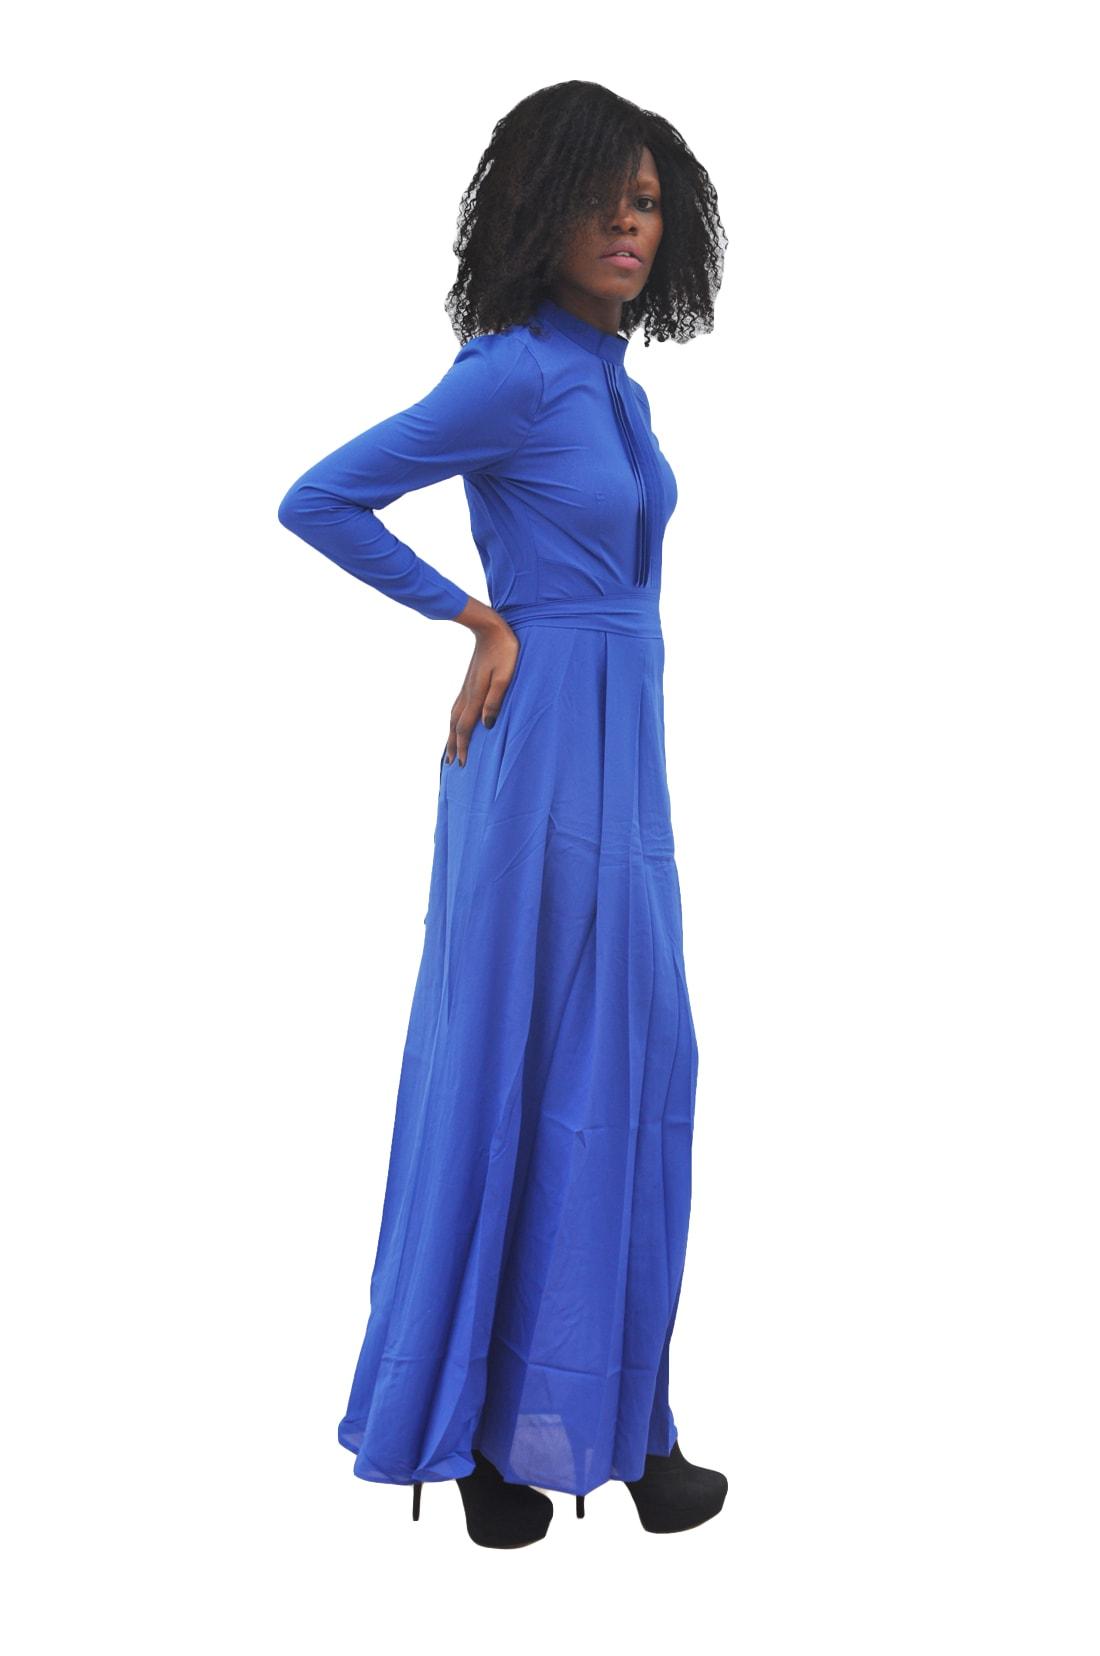 M0293 blue2 Long Sleeve Dresses maureens.com boutique